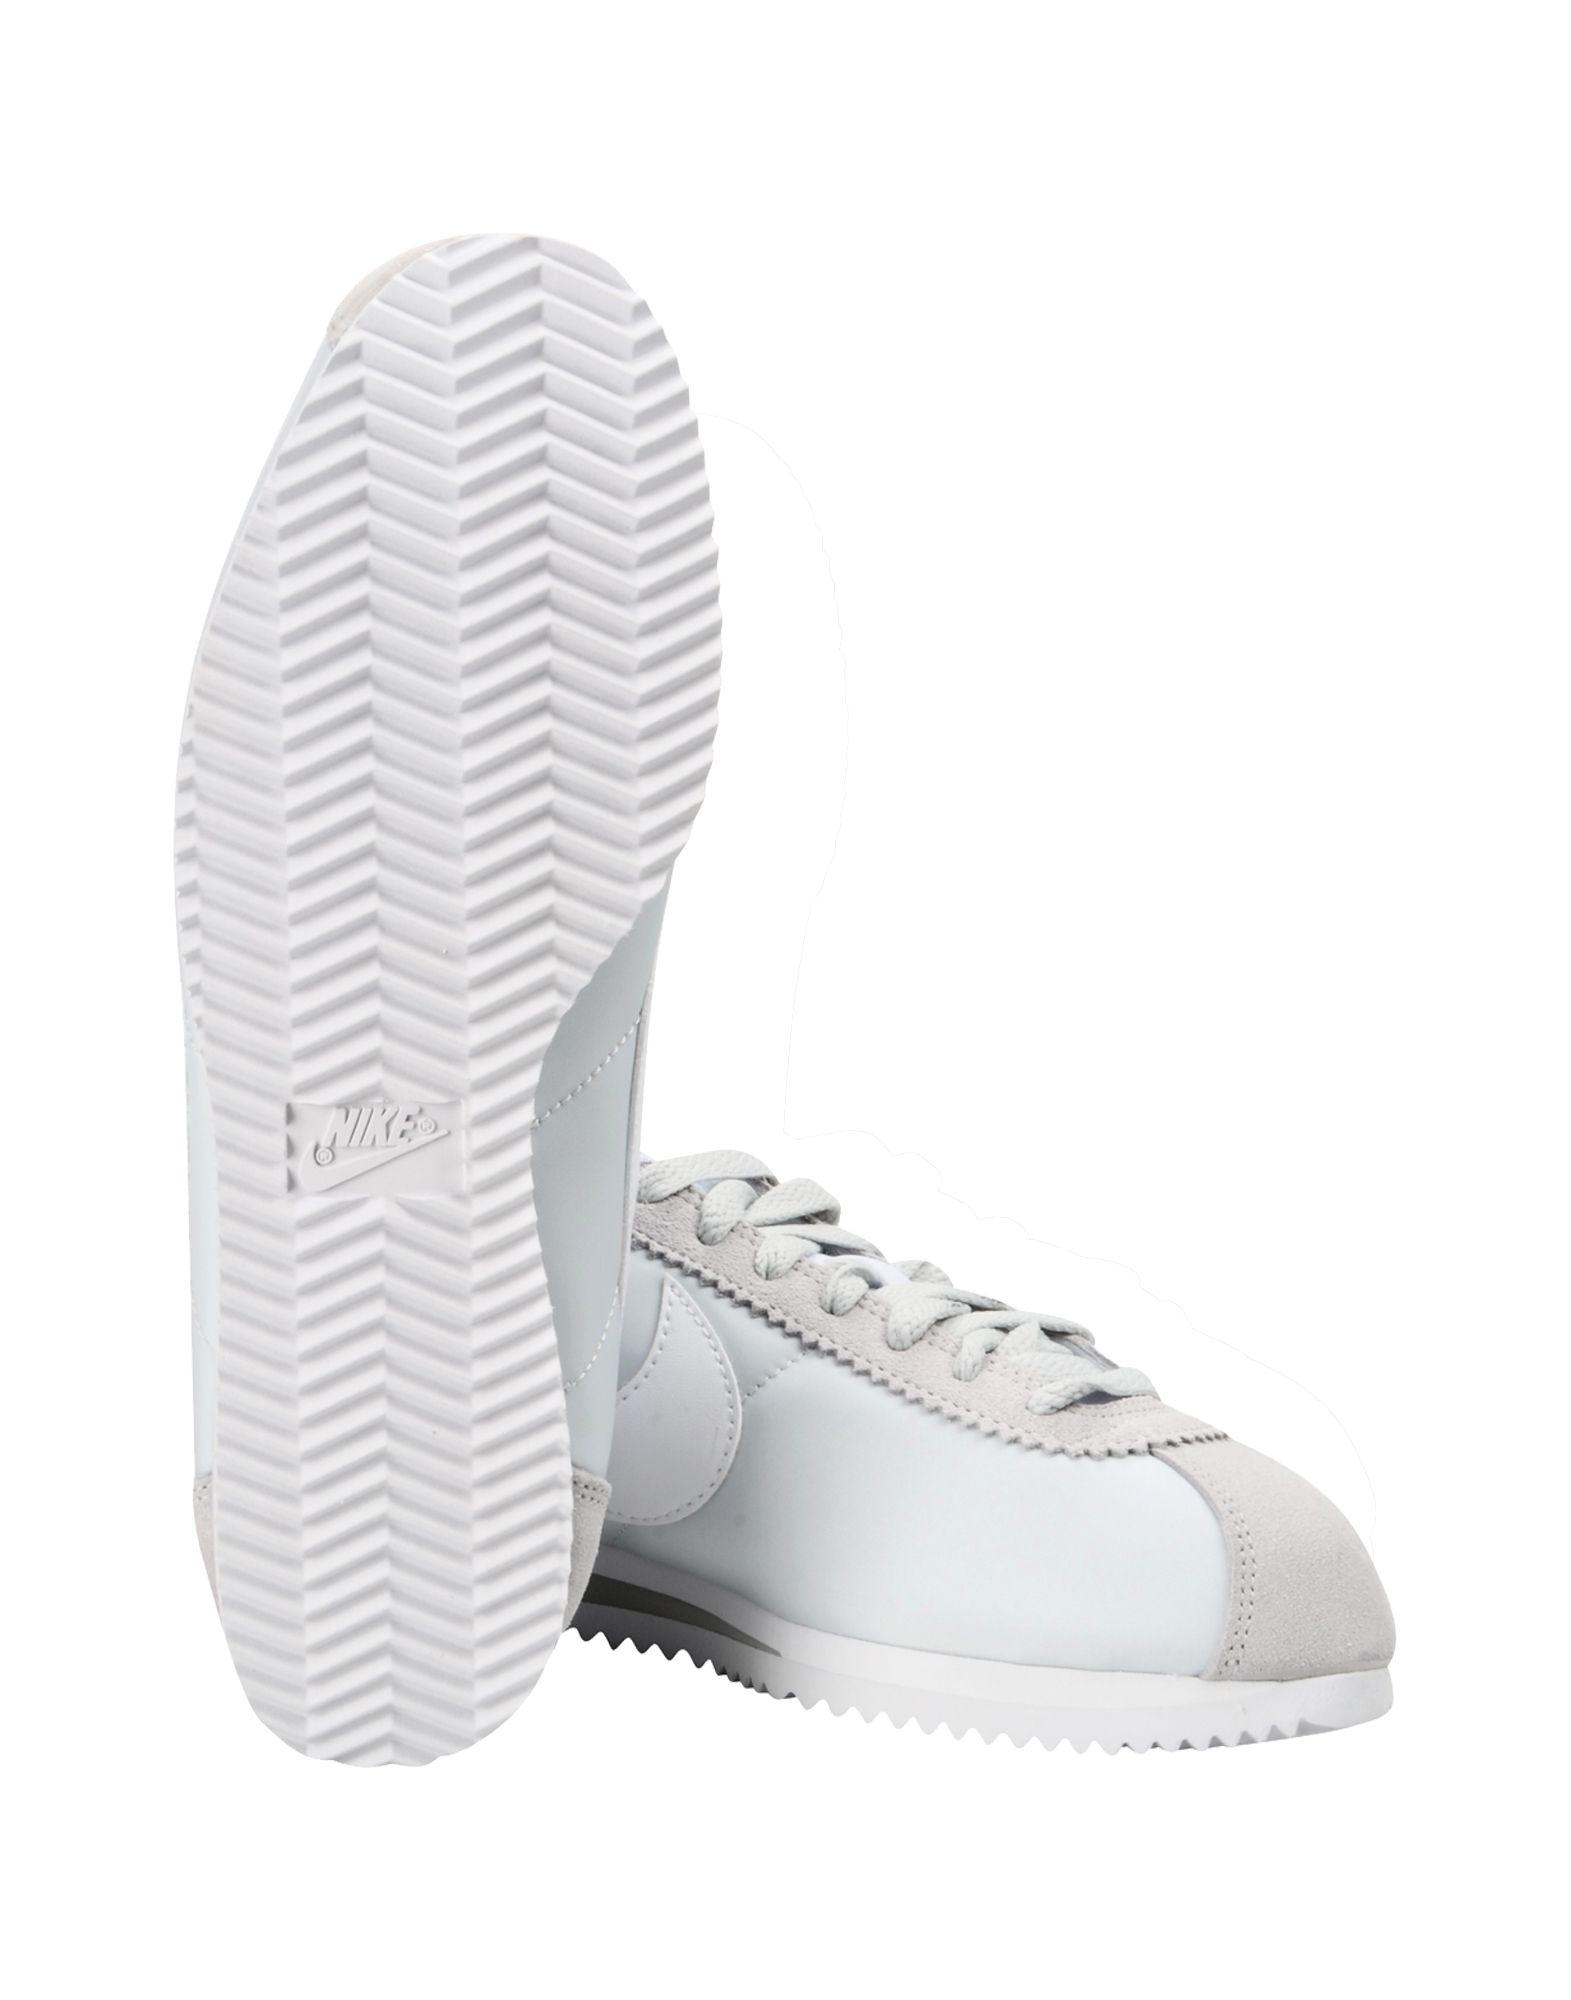 ChaussuresNike Classic Cortez Nylon sur Femme ChaussuresNike sur Nylon WDXK3S 893619